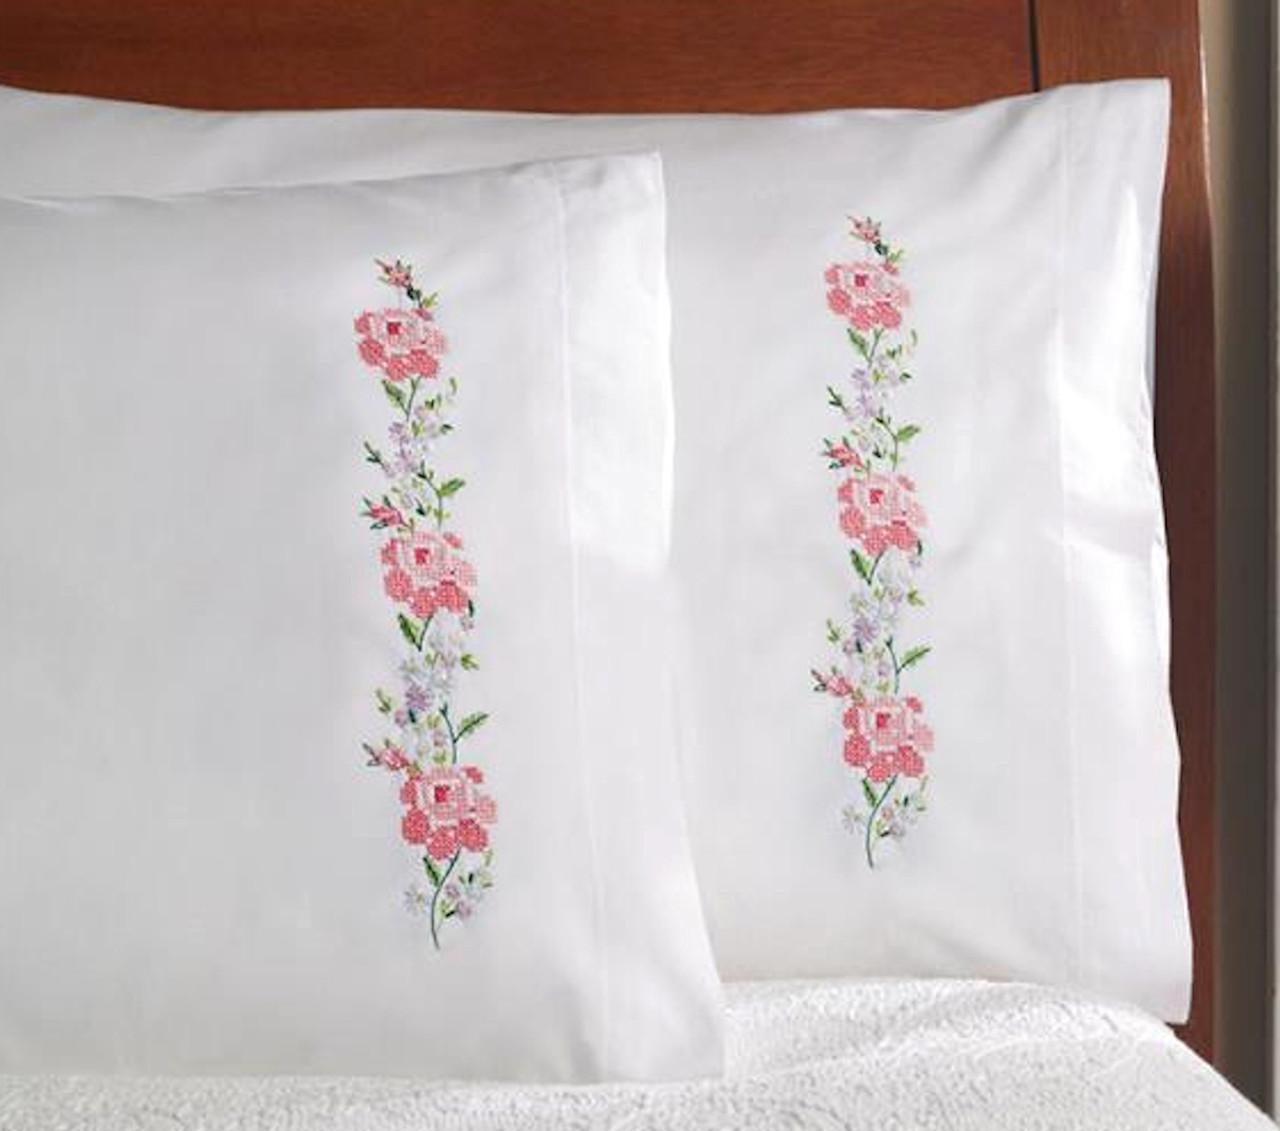 Plaid / Bucilla - Sampler Roses Pillowcases (2)